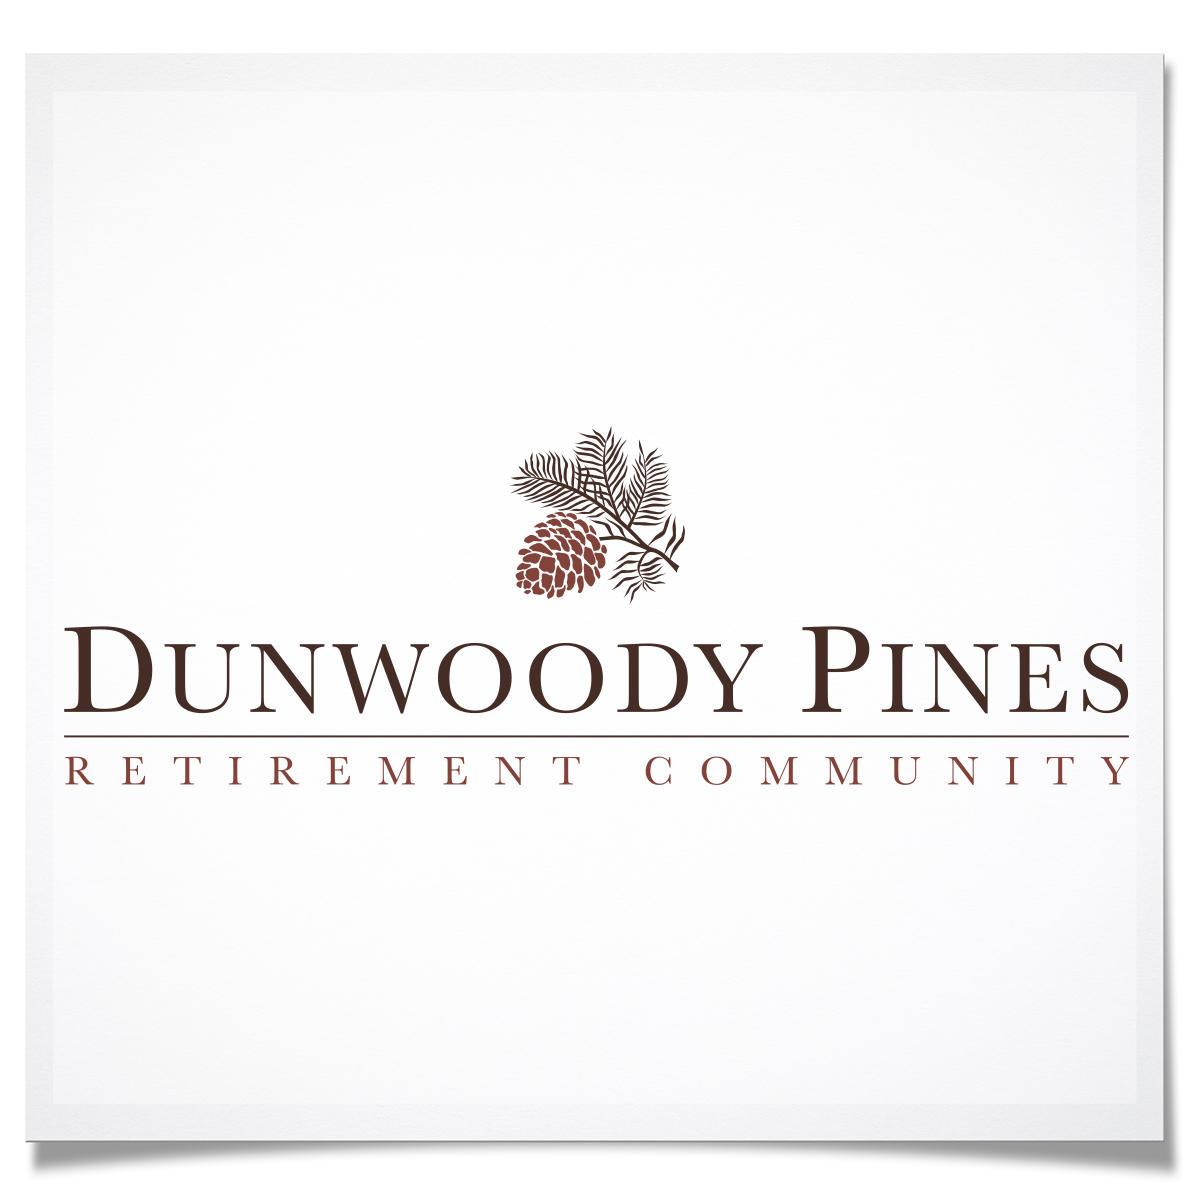 Dunwoody Pines Retirement Community - Dunwoody, GA - Retirement Communities